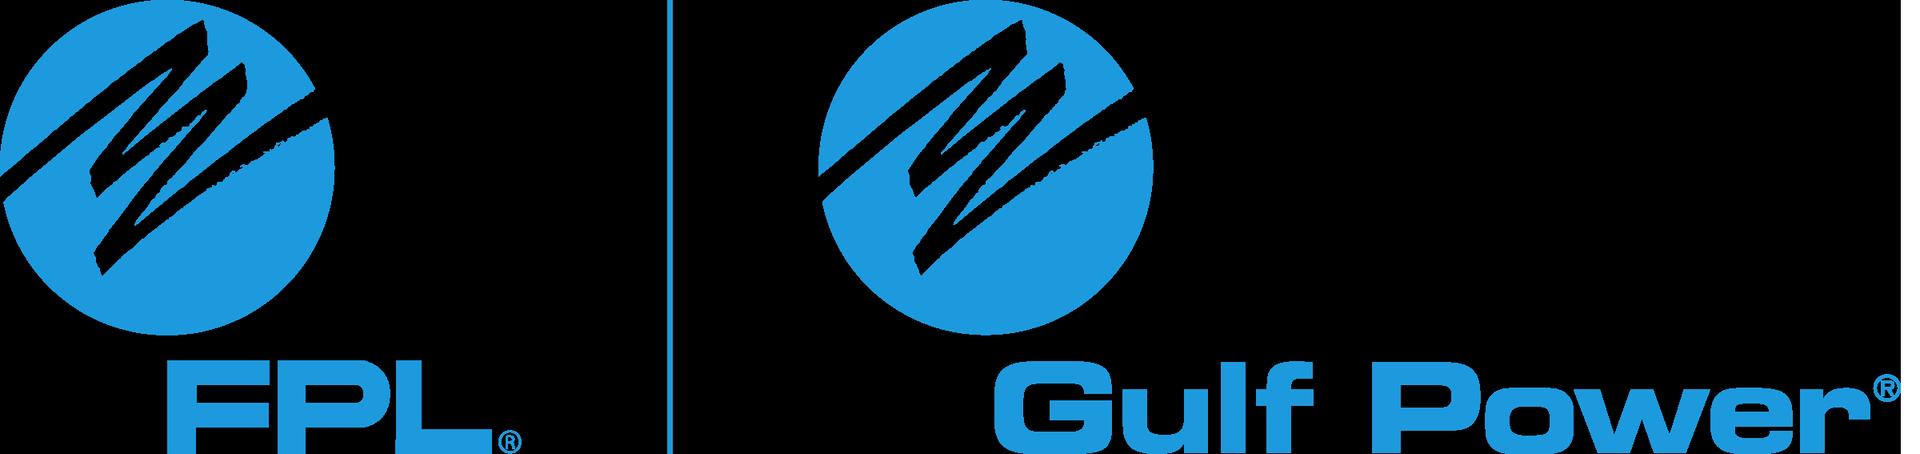 FPL Gulf Power